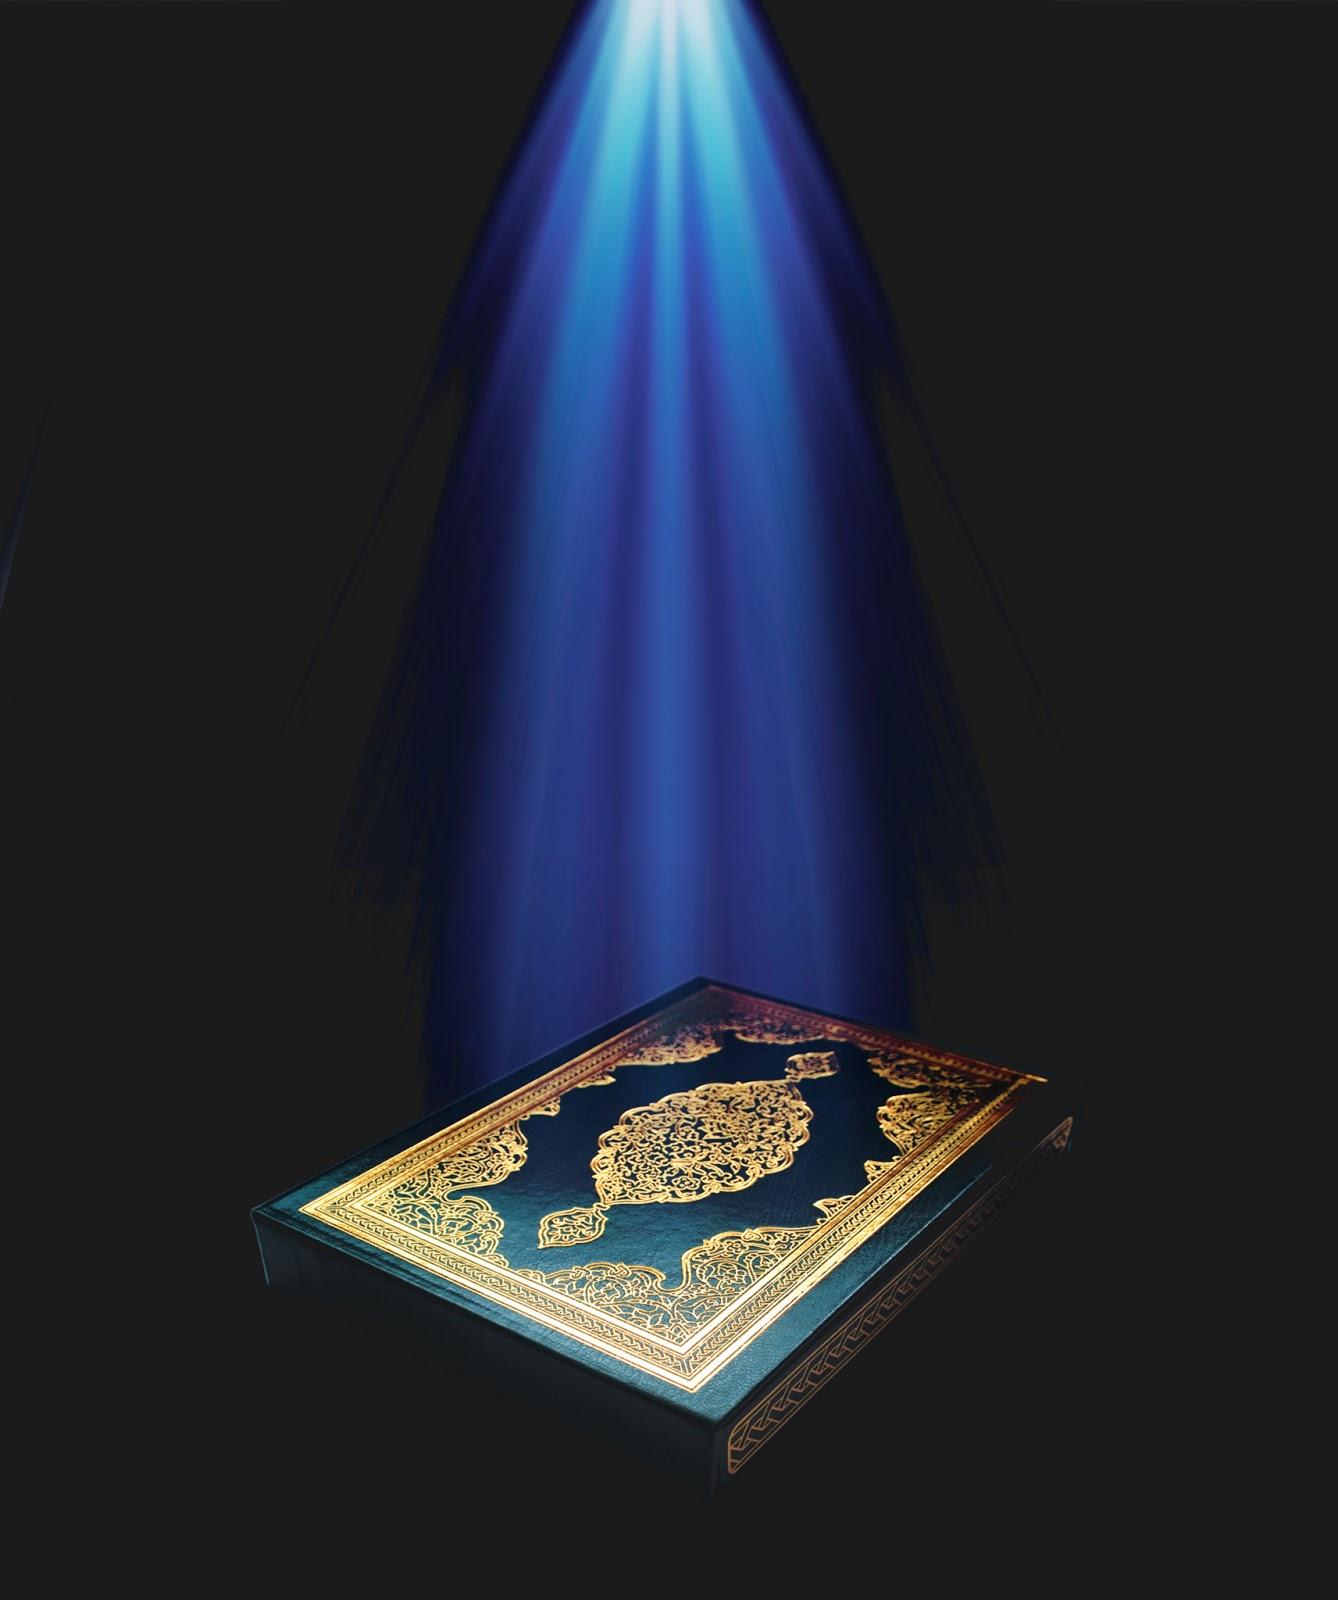 Islamic Girl Wallpaper All In One Computer Mobiles Software Keys Islamic